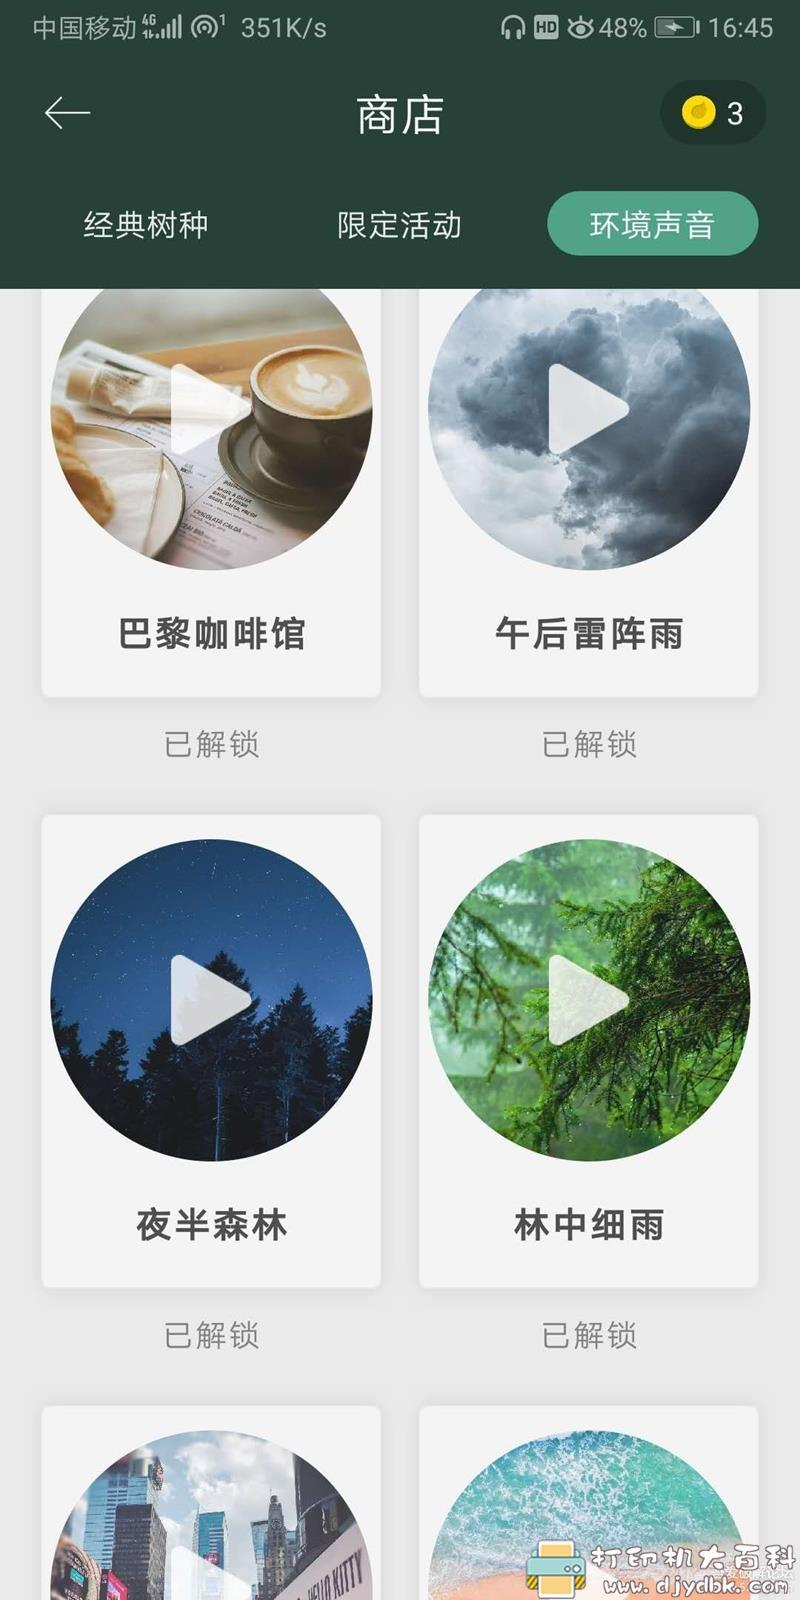 [Android]辅助你放下手机专注工作的app:Forest专注森林 v4.16.1 免费专业版图片 No.5